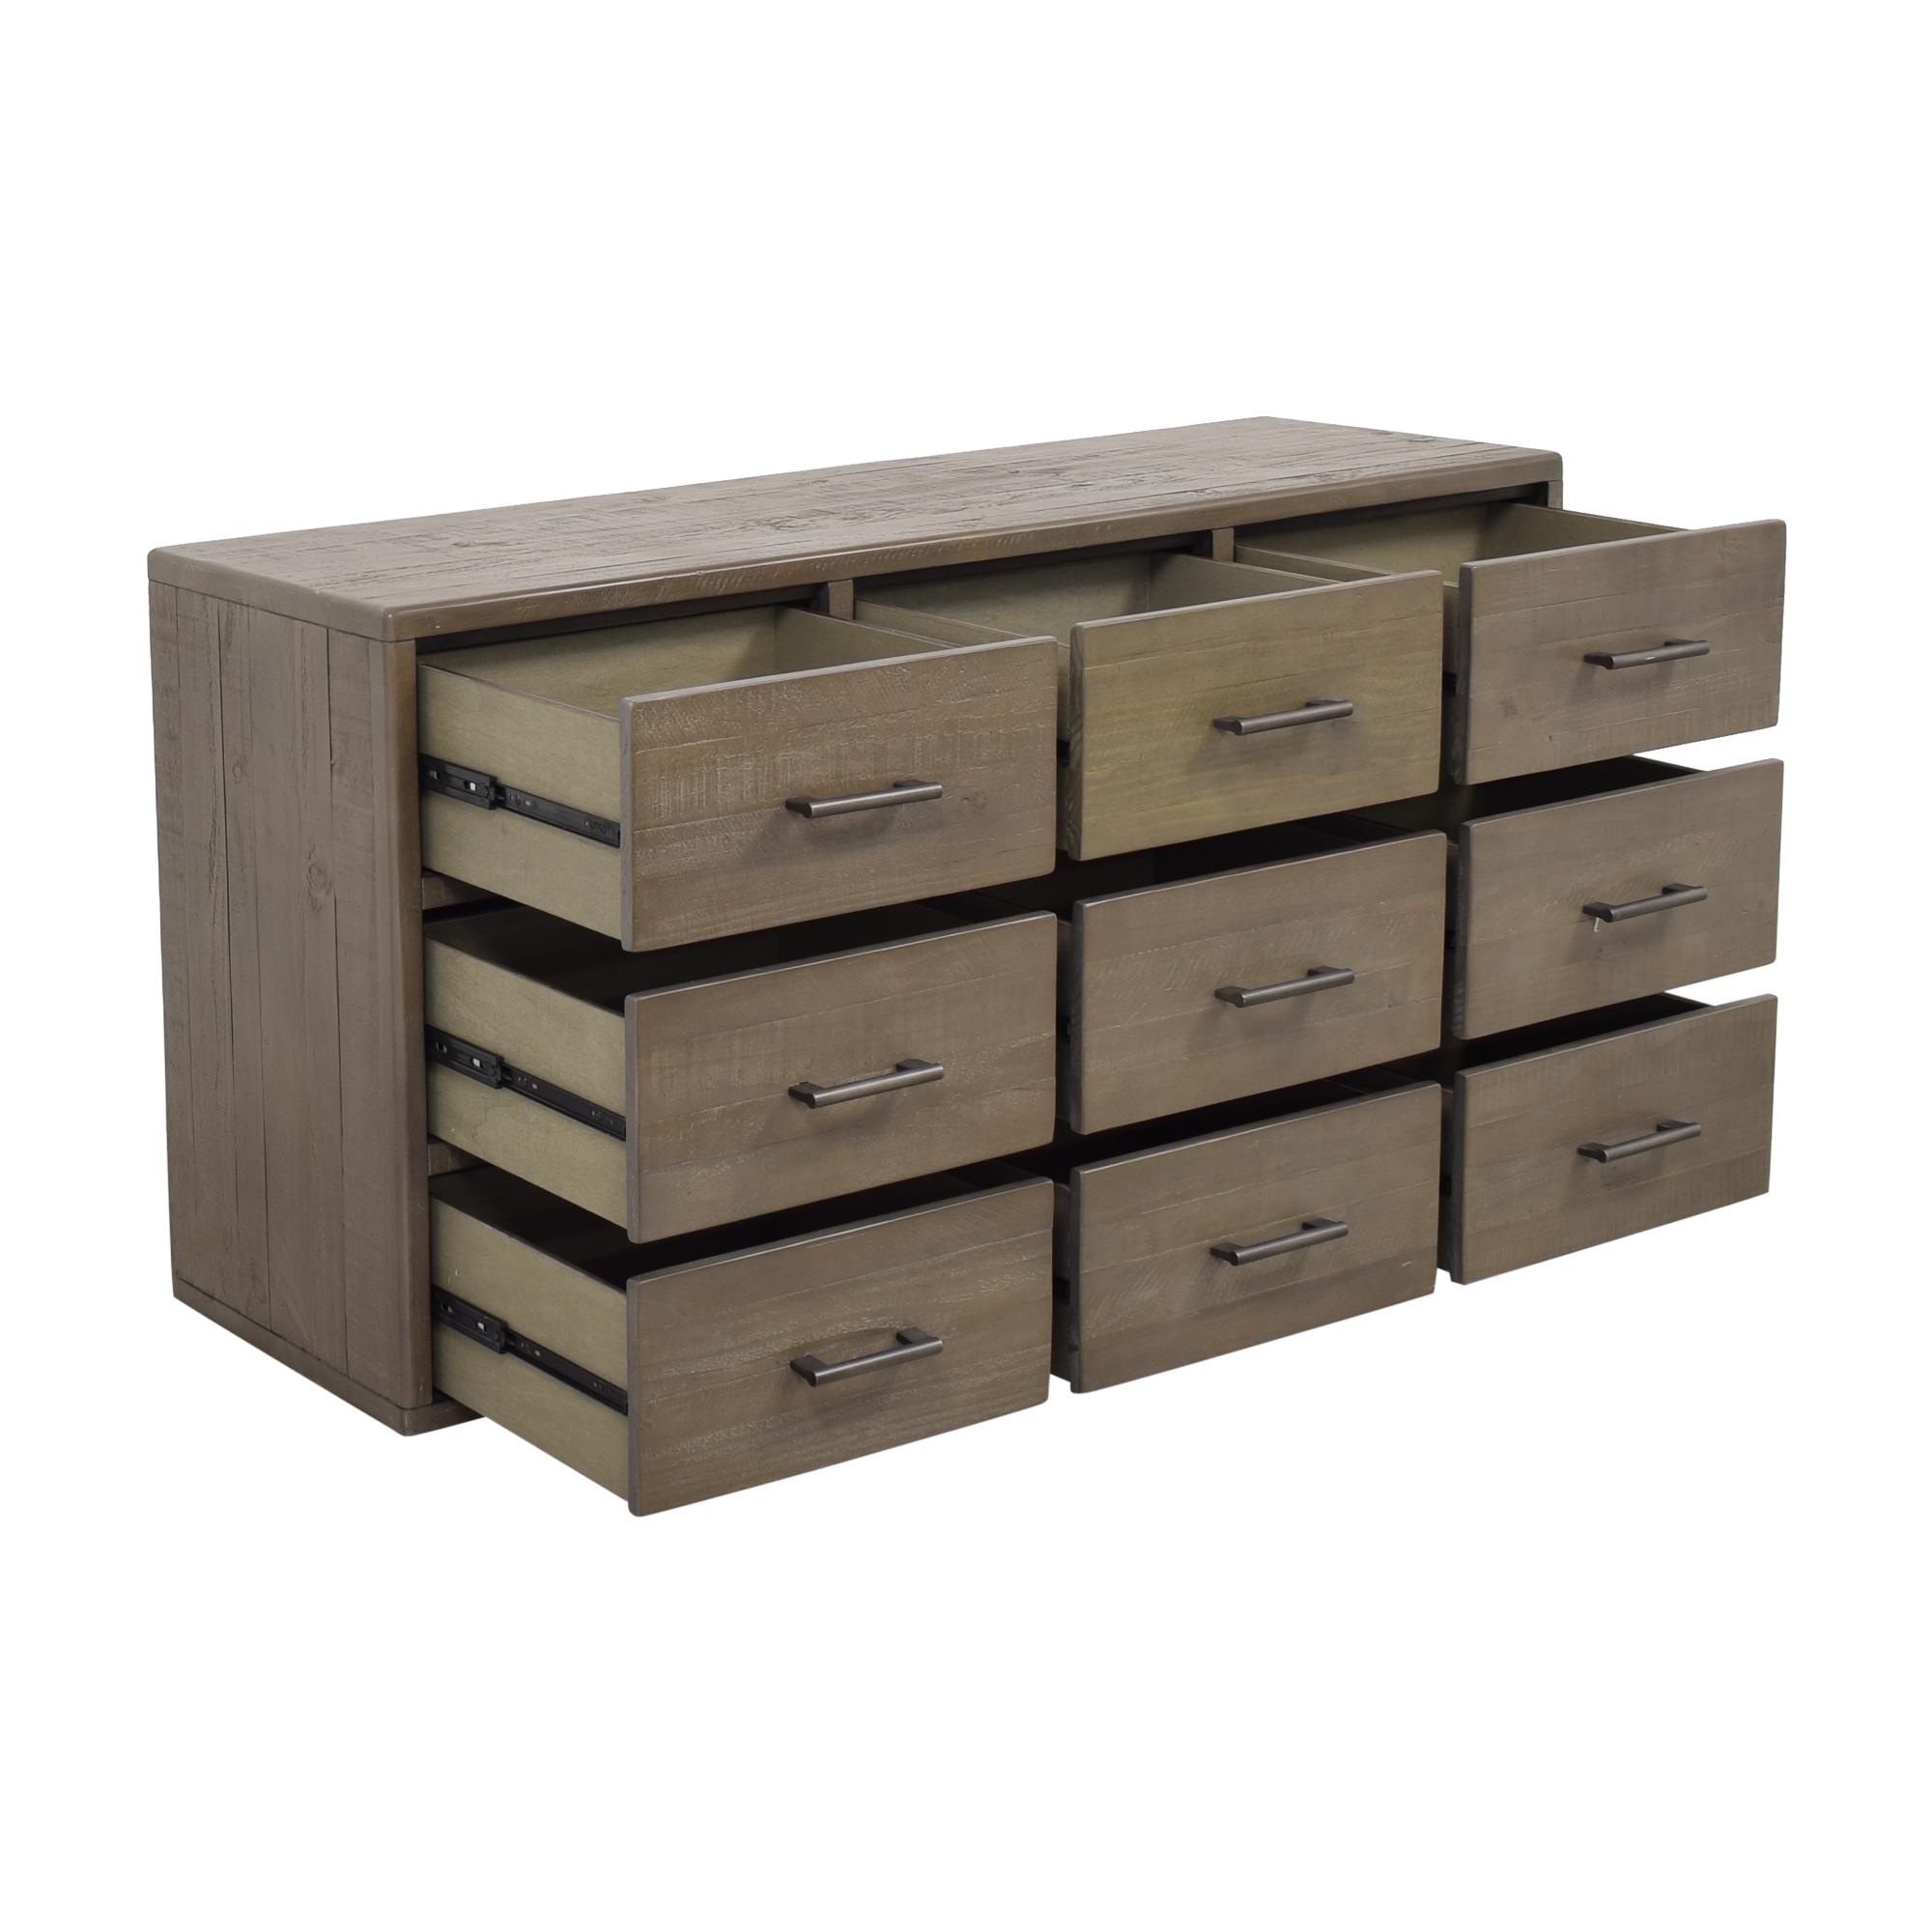 Macy's Macy's Brandon 9 Drawer Dresser